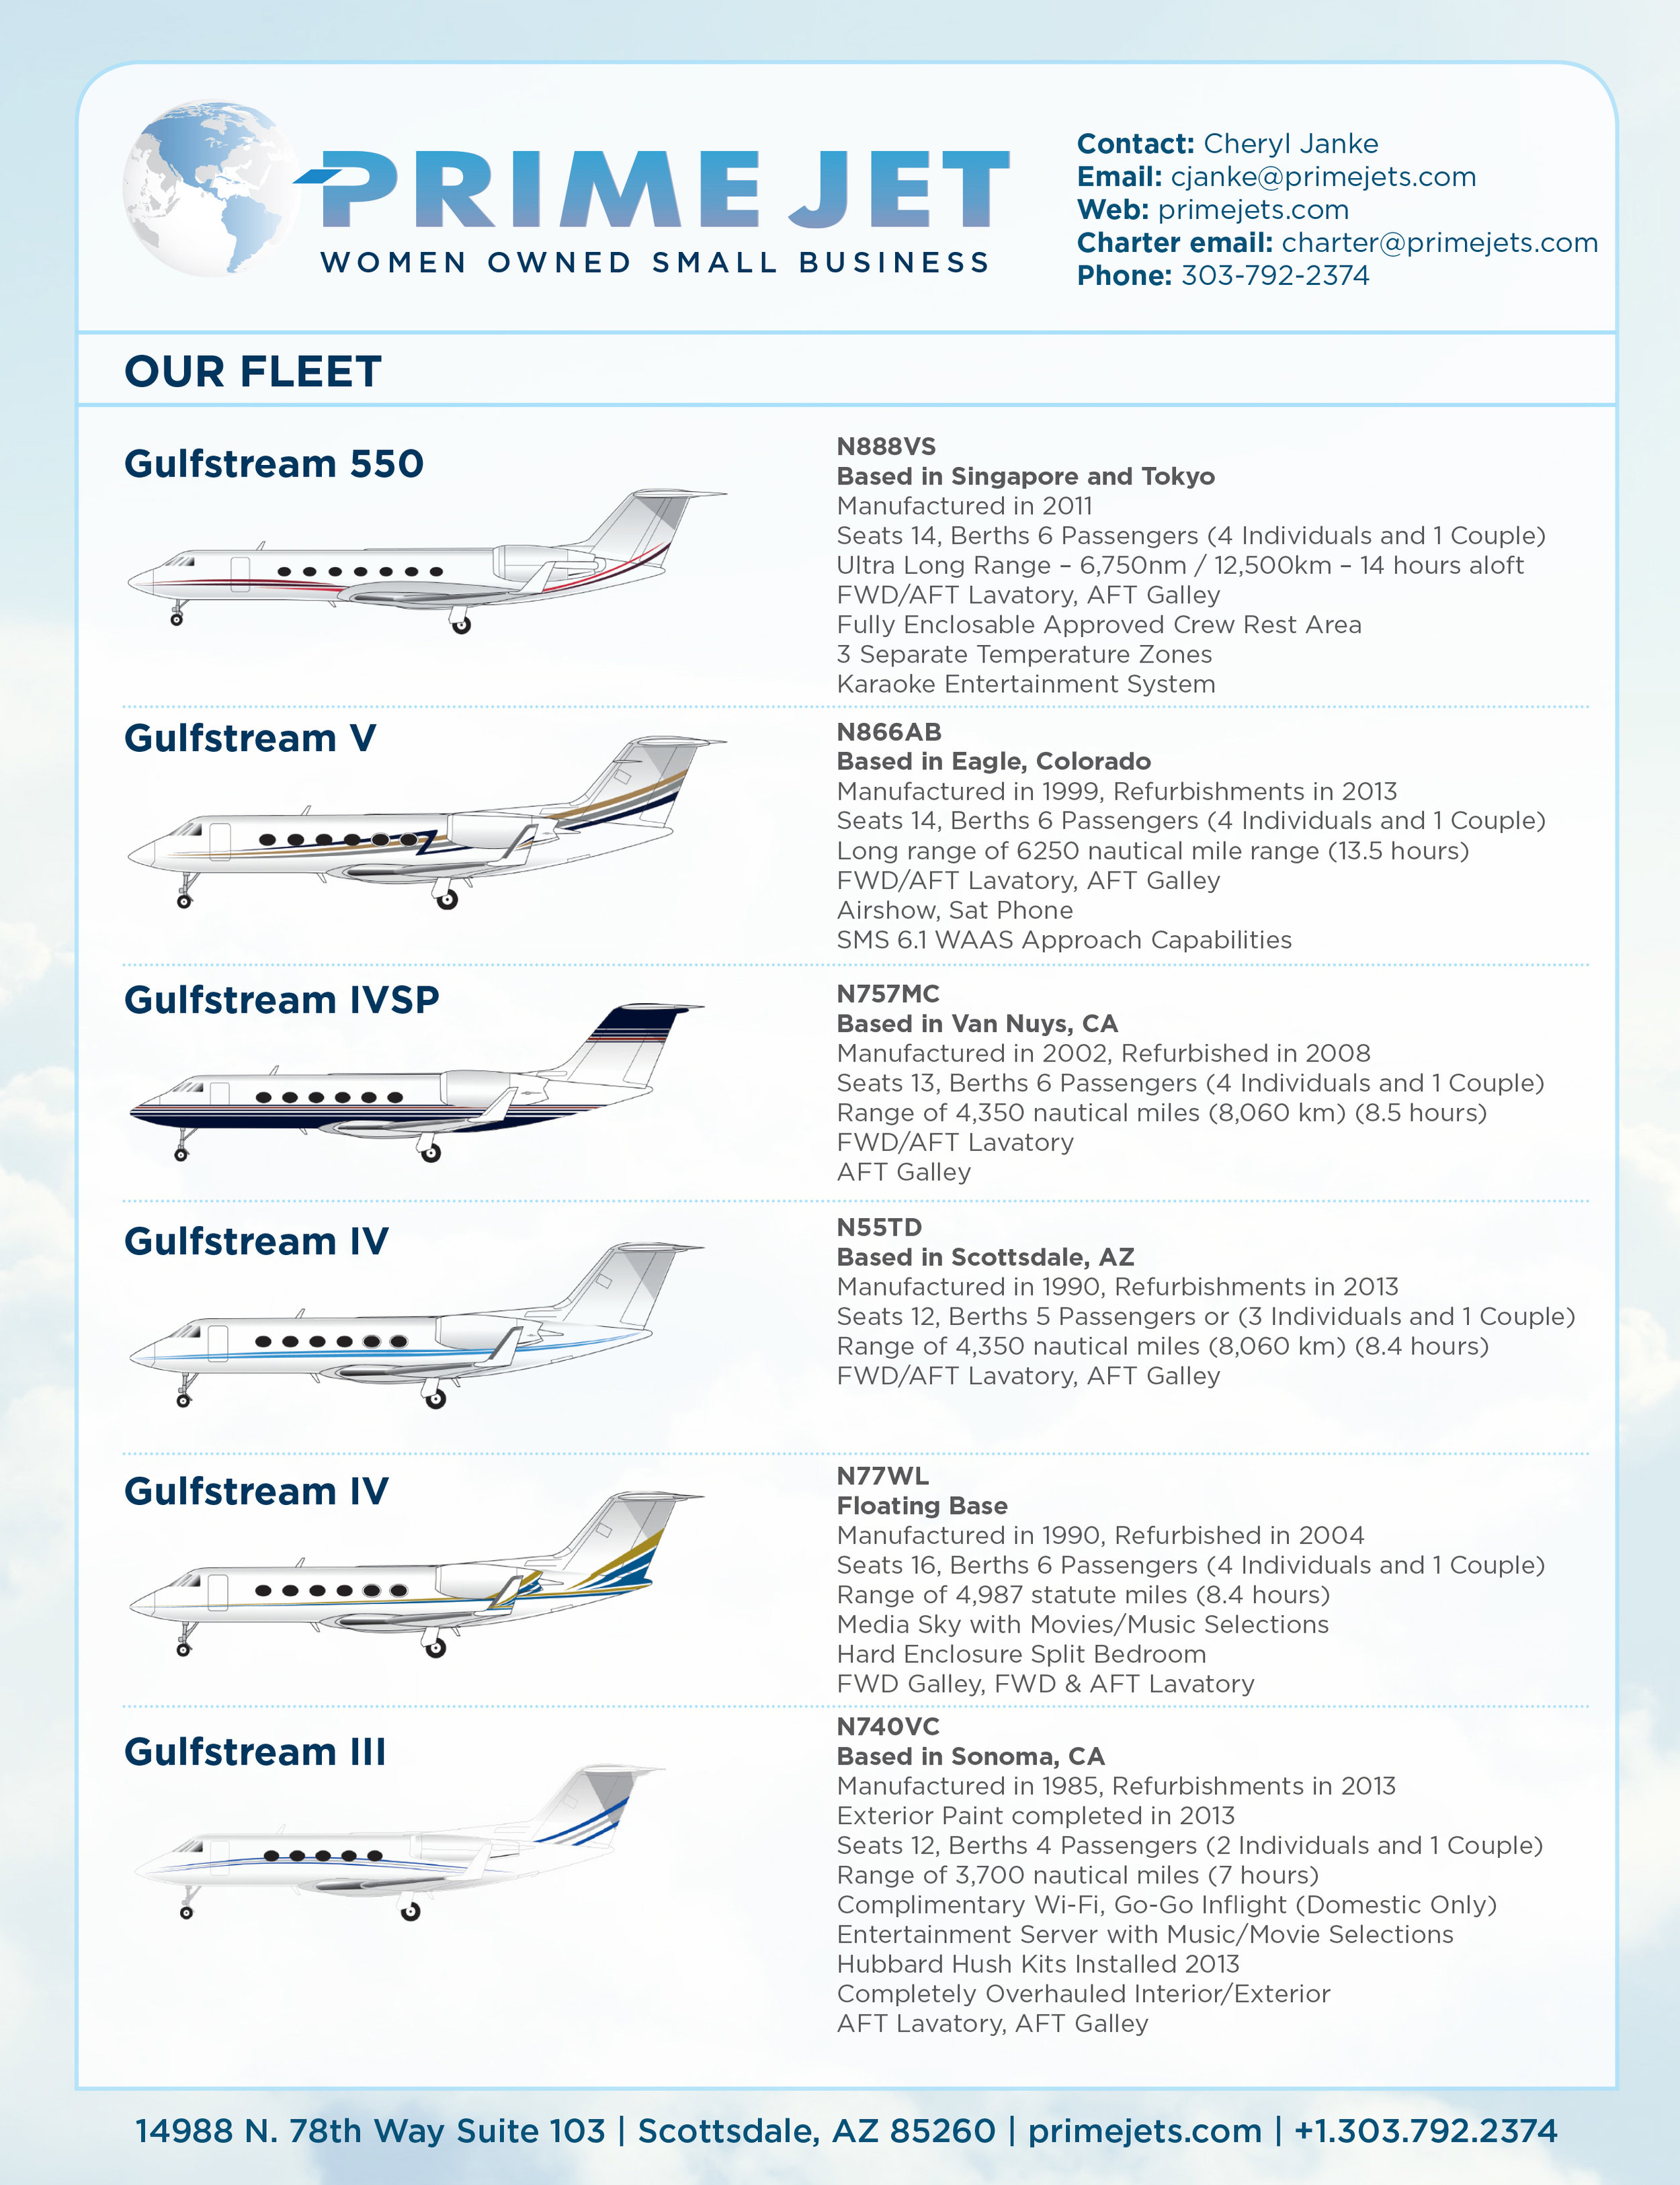 PRIMEJET_fleet.jpg